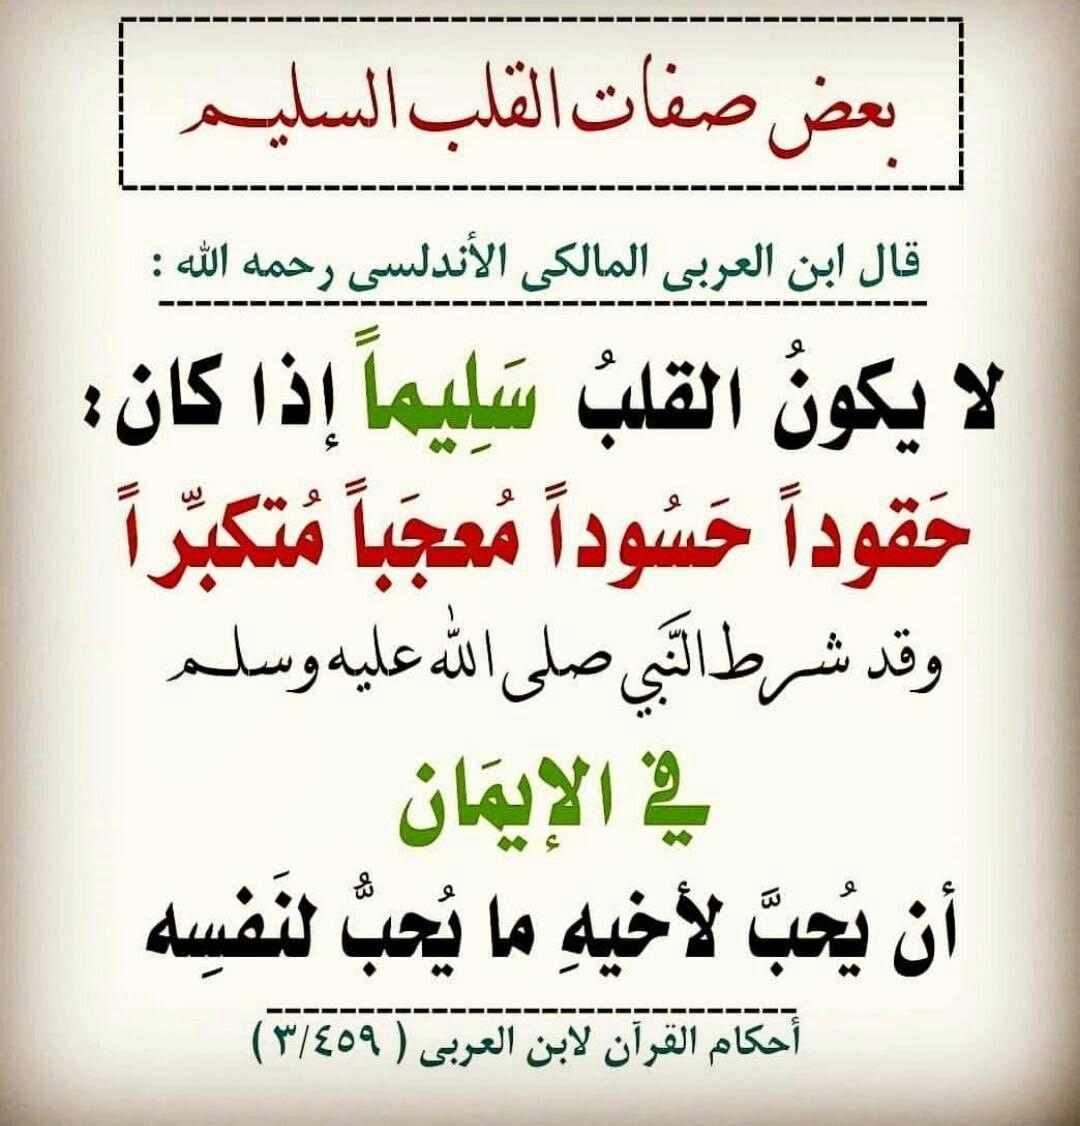 Pin By Alihamdan67 On أقوال علماء أهل السنة Islamic Quotes Islamic Information Quotes